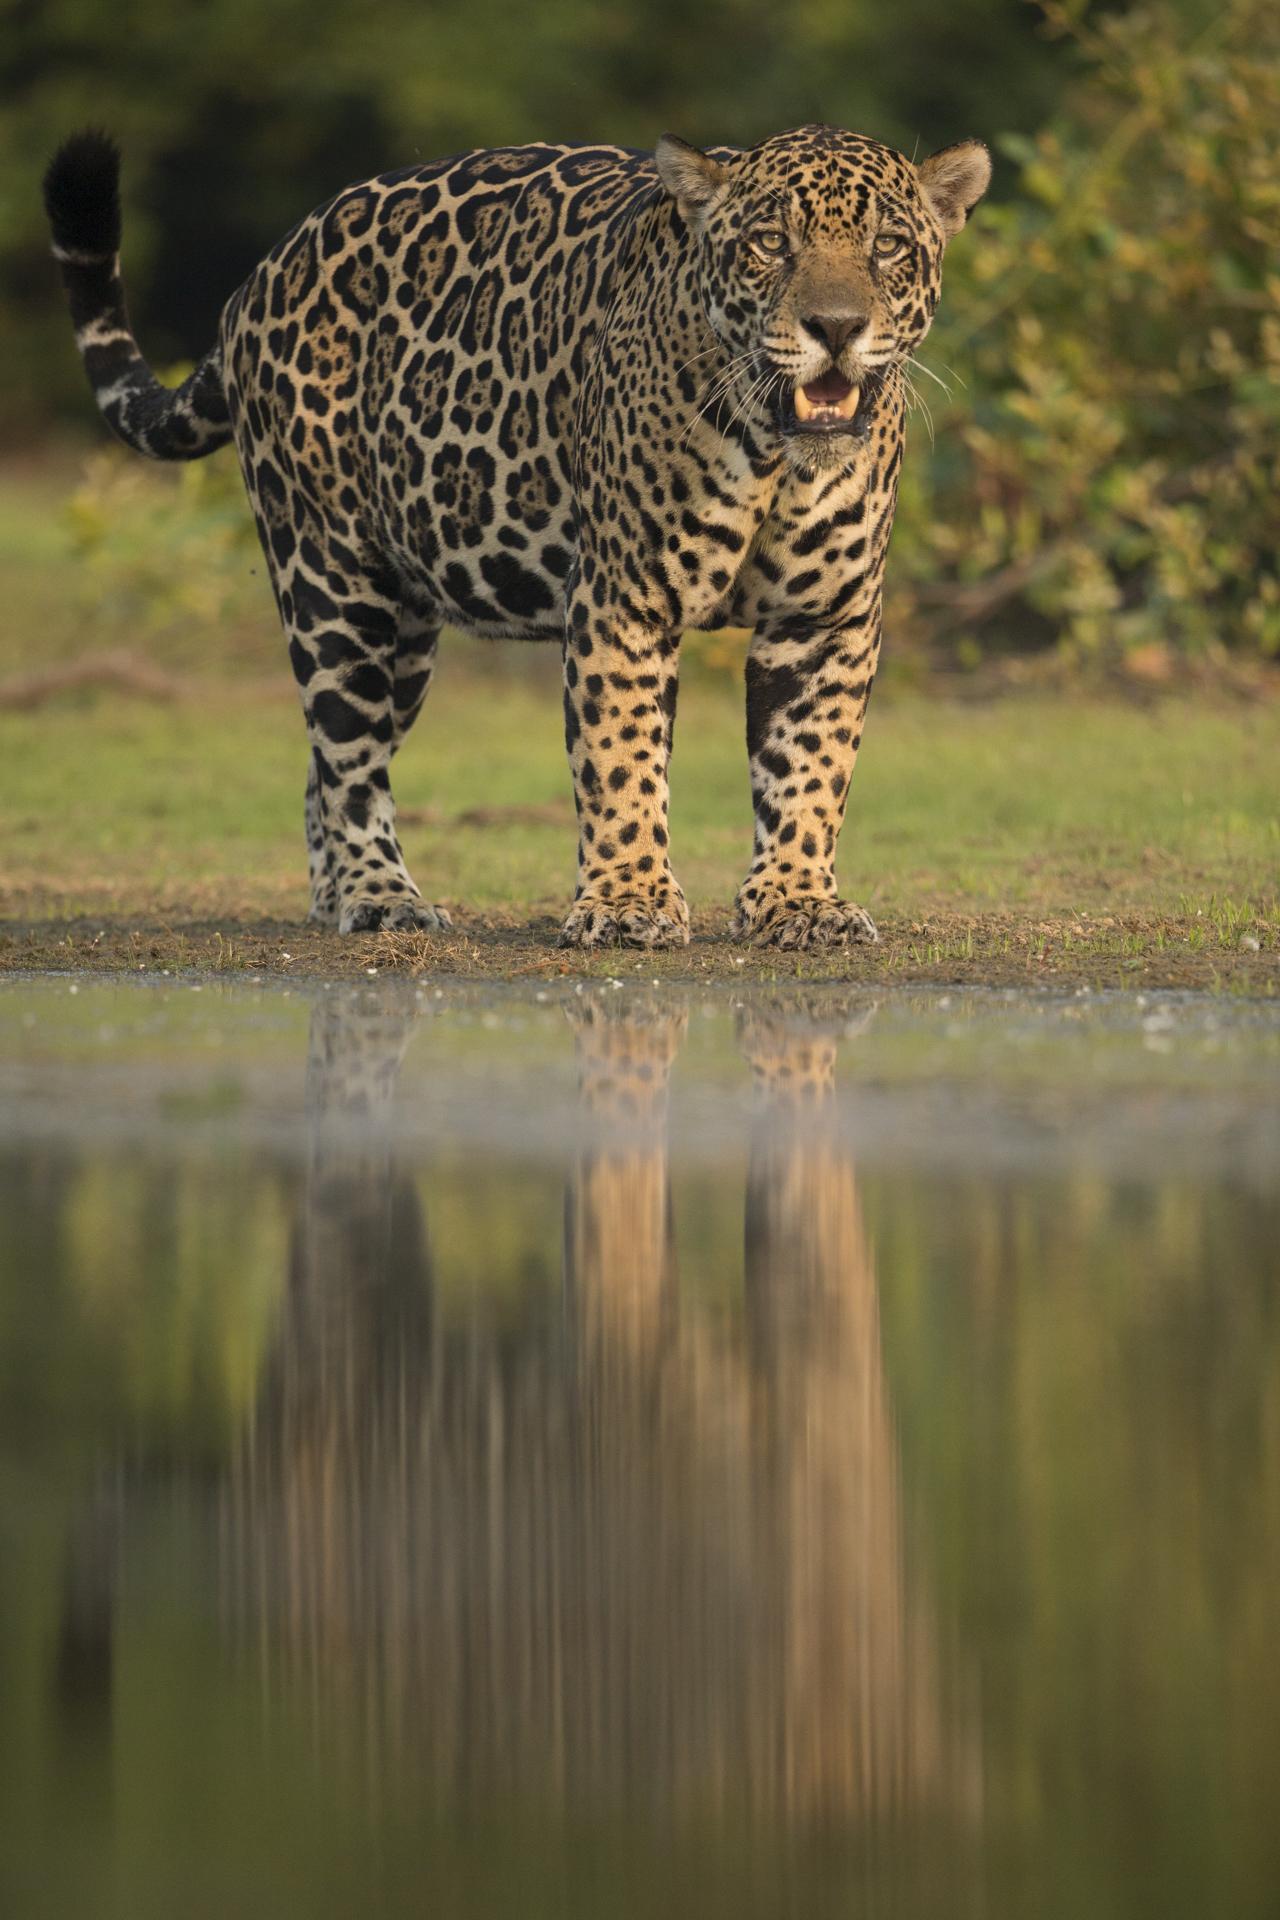 A jaguar in the Pantanal.